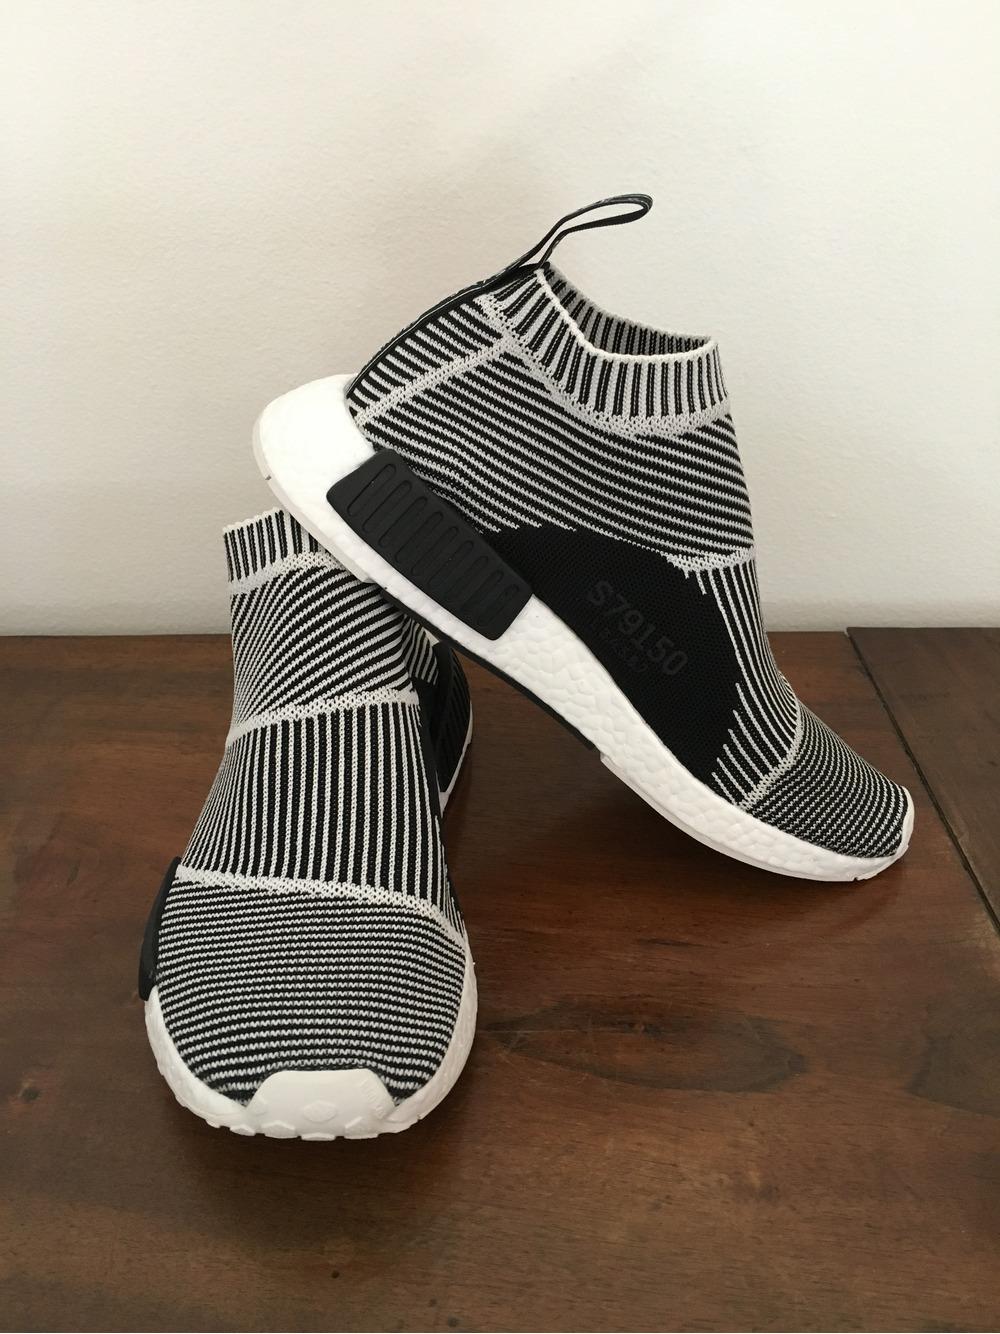 ukexkc Adidas NMD PK CS1 City Sock Primeknit (#313179) from Xshoot83 at KLEKT